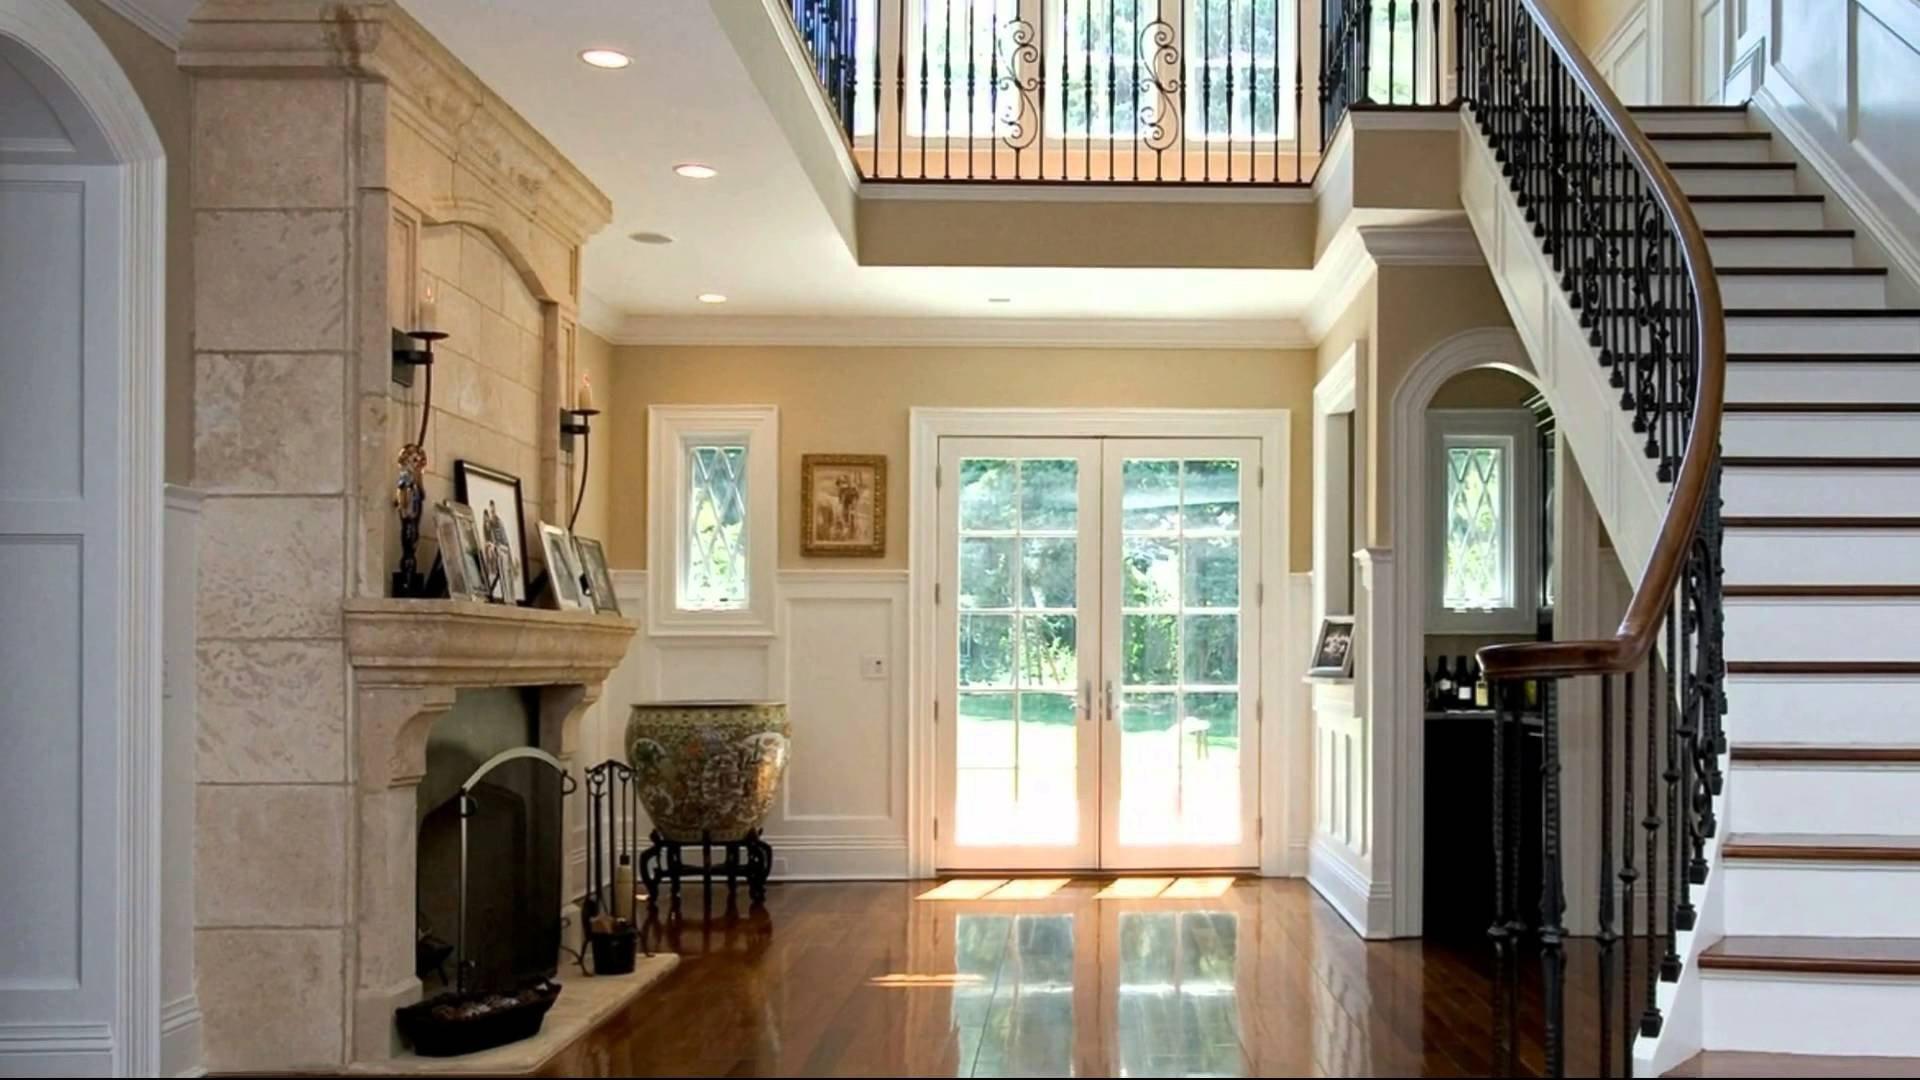 Entrance Decor Ideas for Home Lovely 10 Fabulous Ideas for Your Modern Entryway Decor